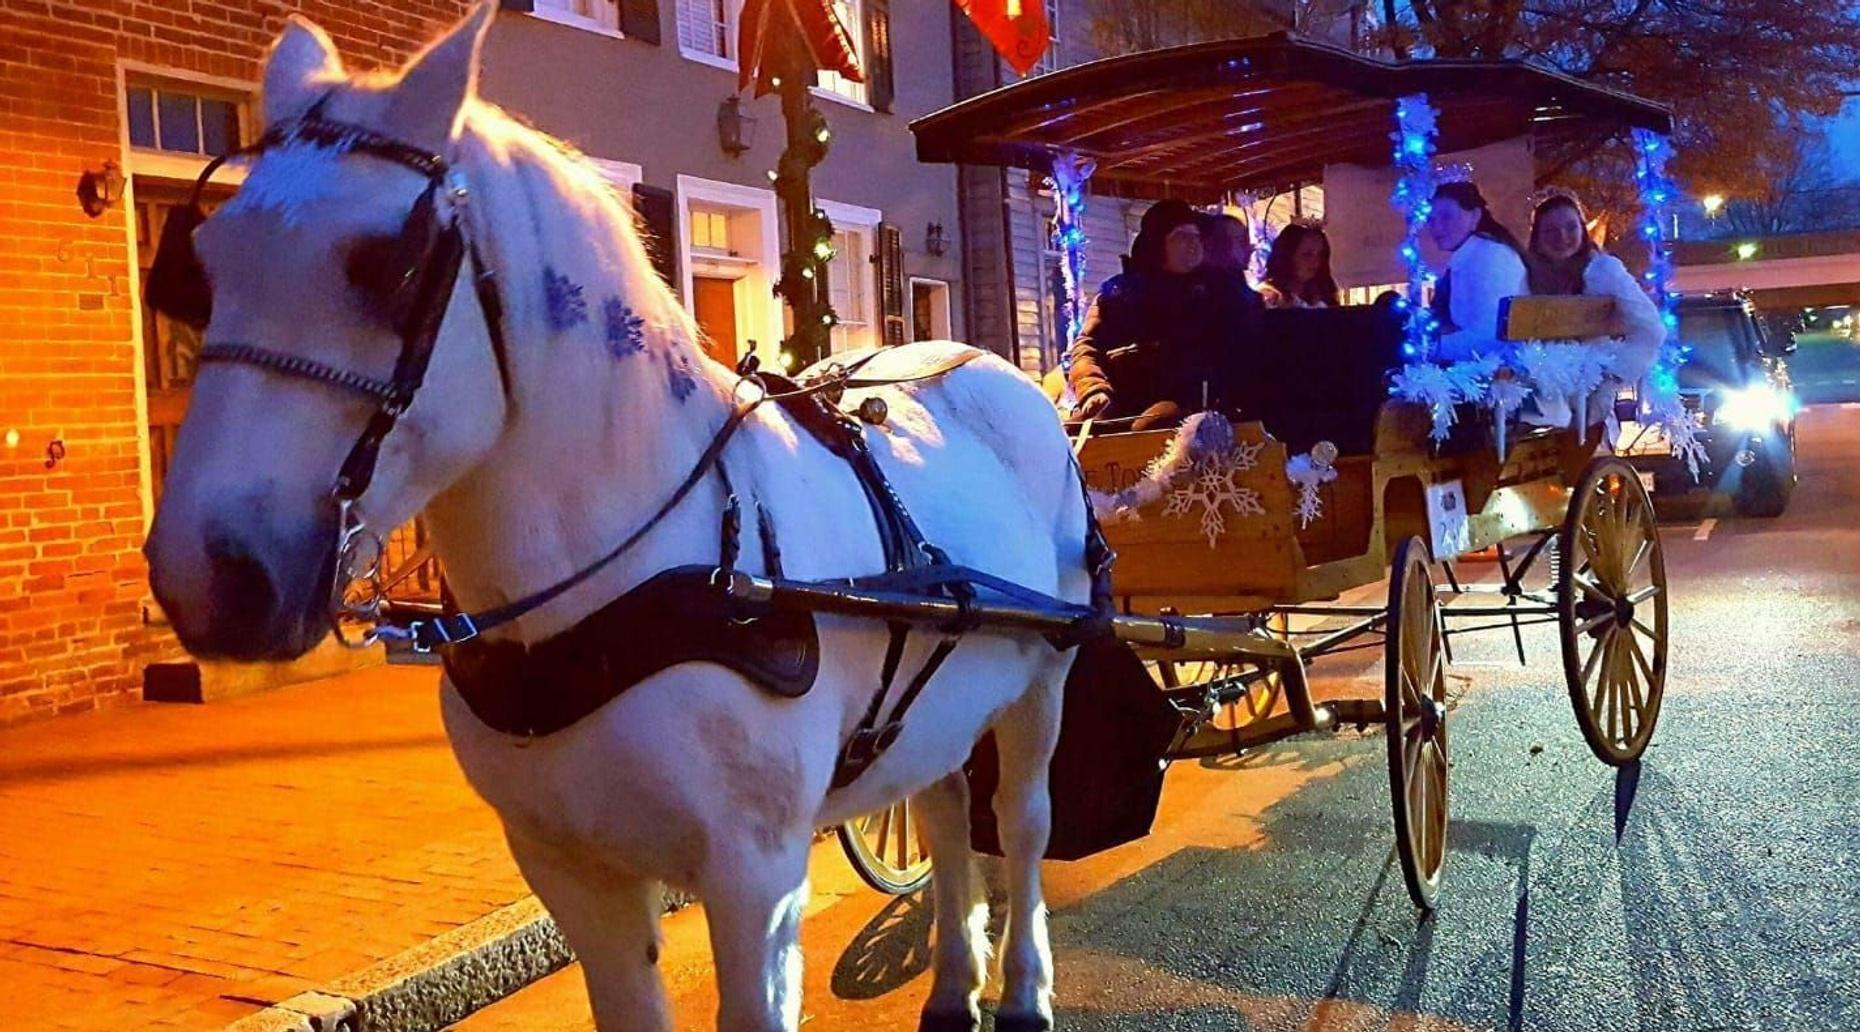 Small Group Christmas Carriage Tour